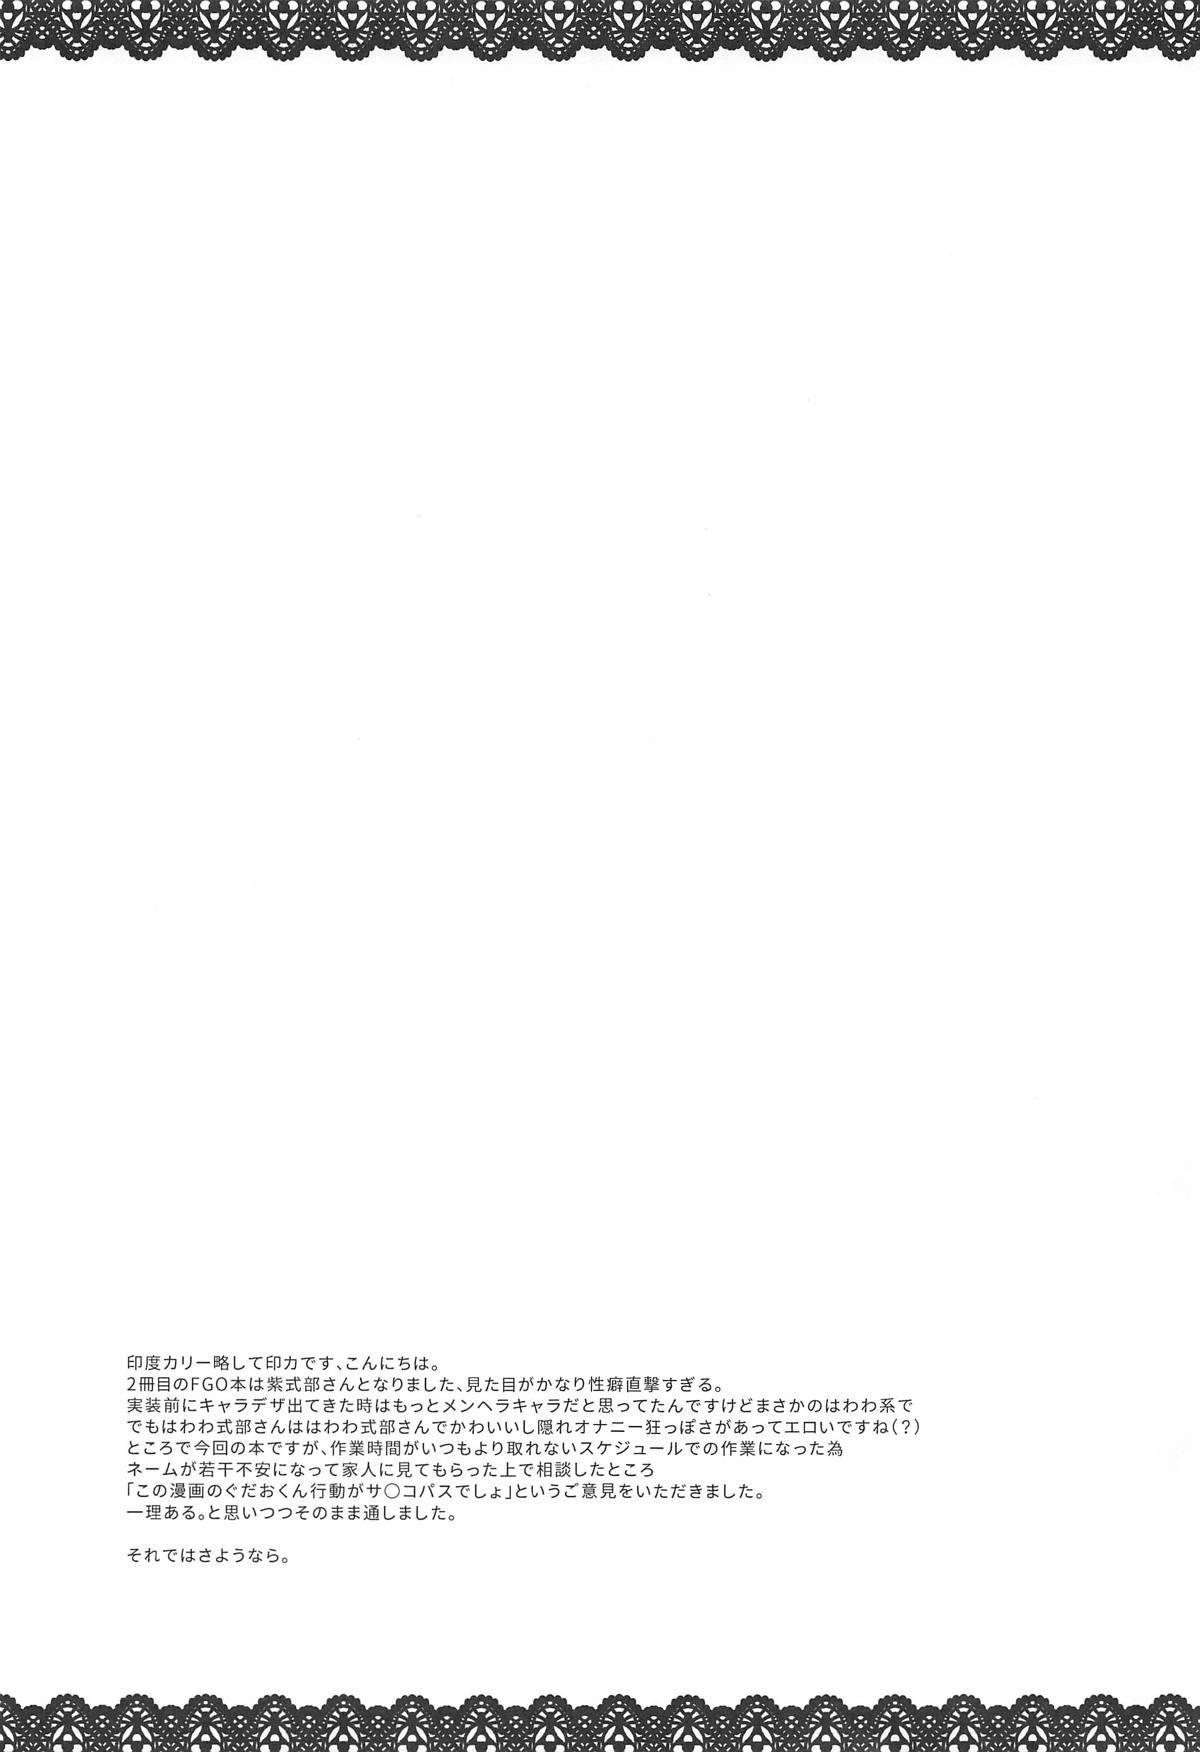 Joryuu Kannou Muramura Shikibu 20